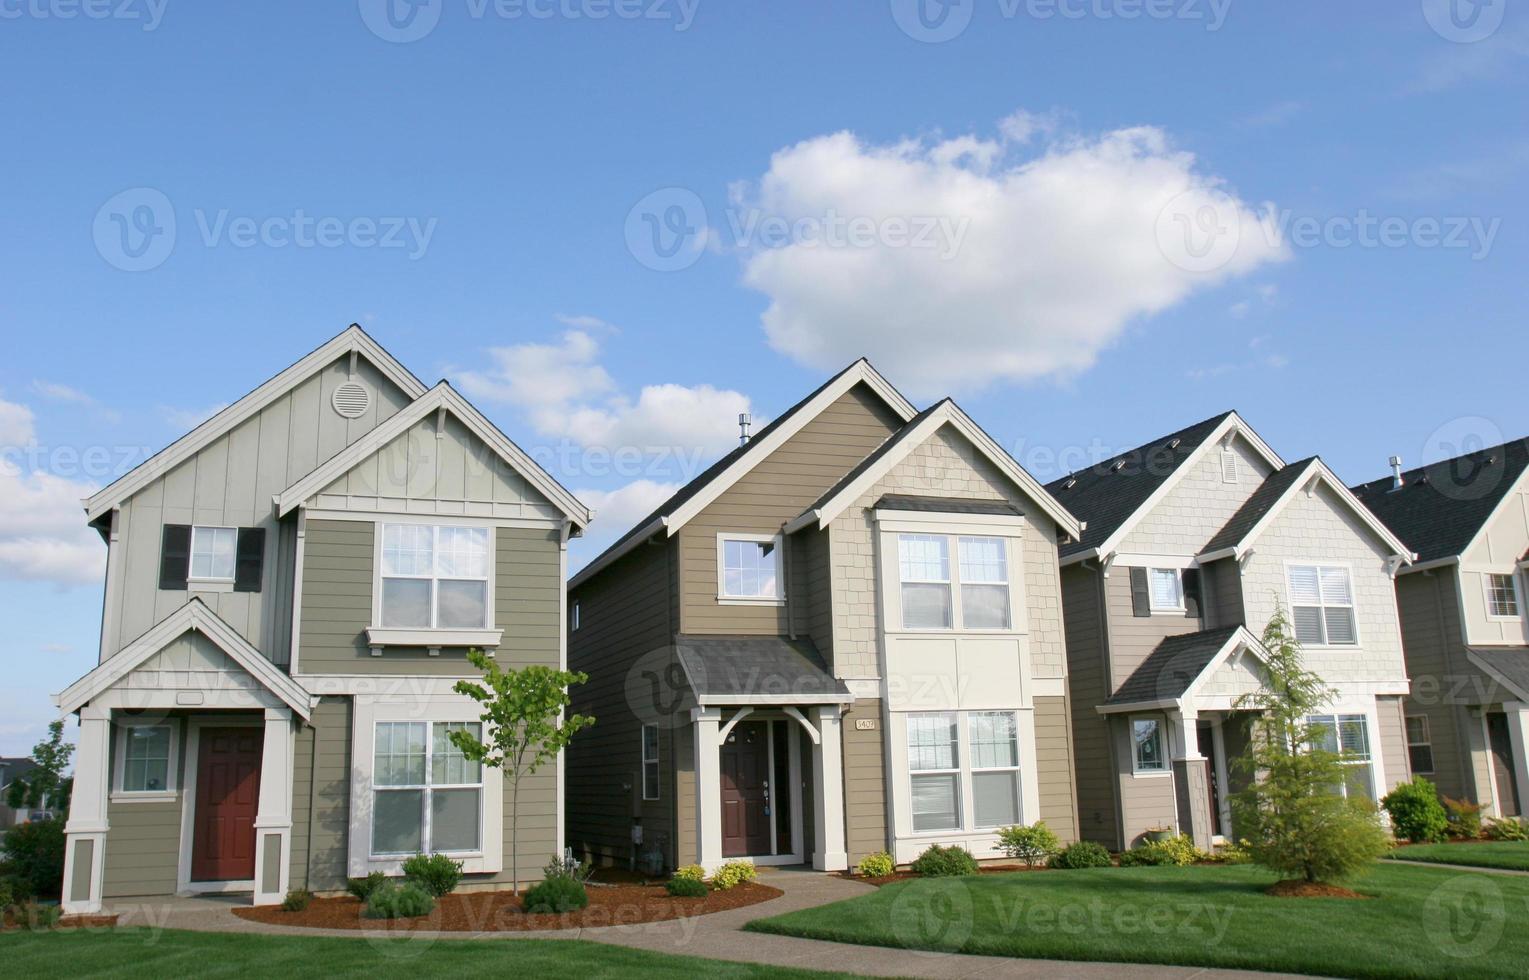 casas ensolaradas foto